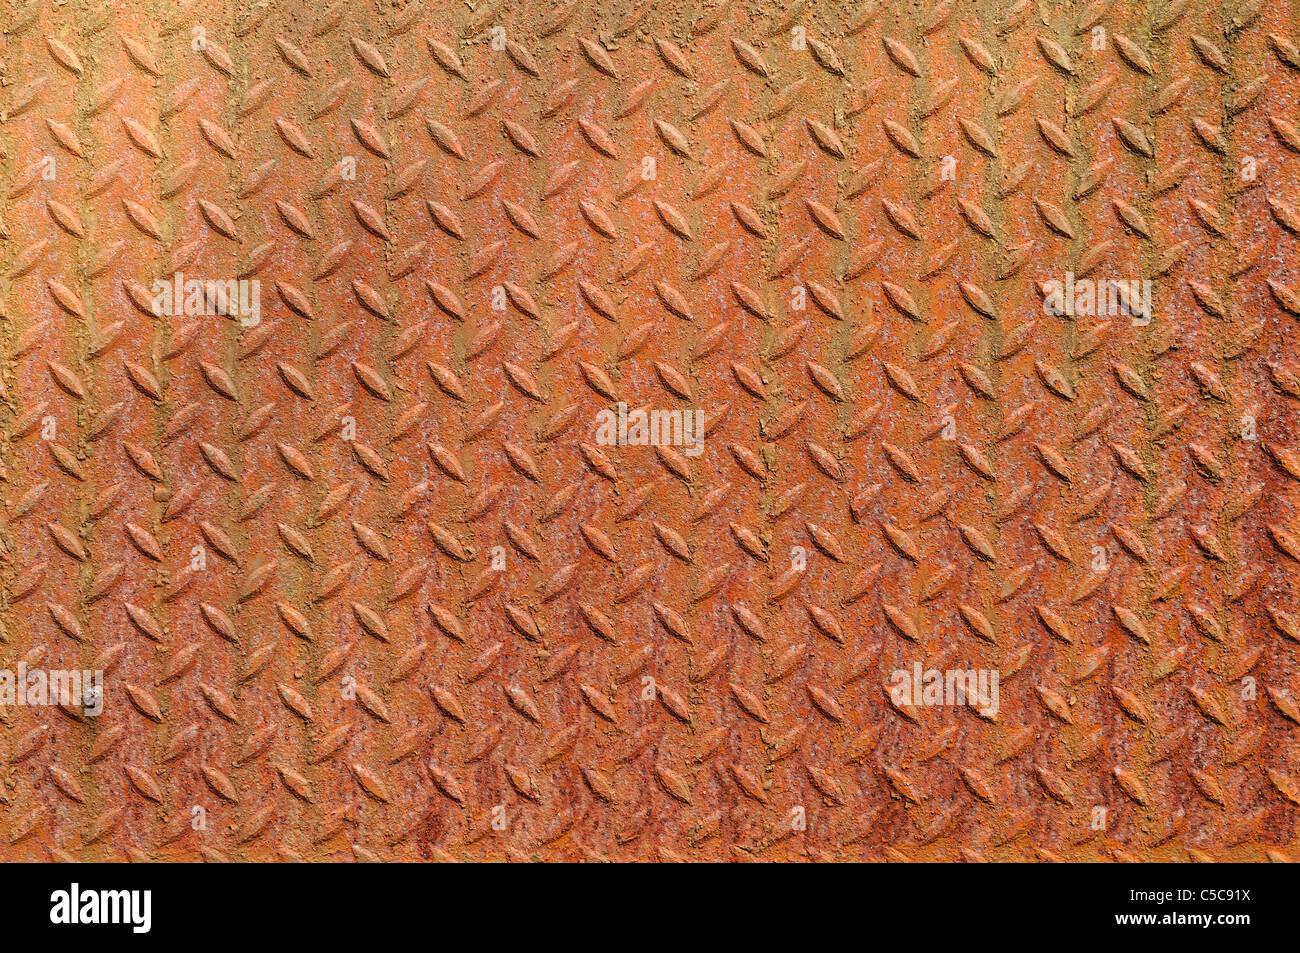 Textura de grunge metal placa de diamante. Imagen De Stock